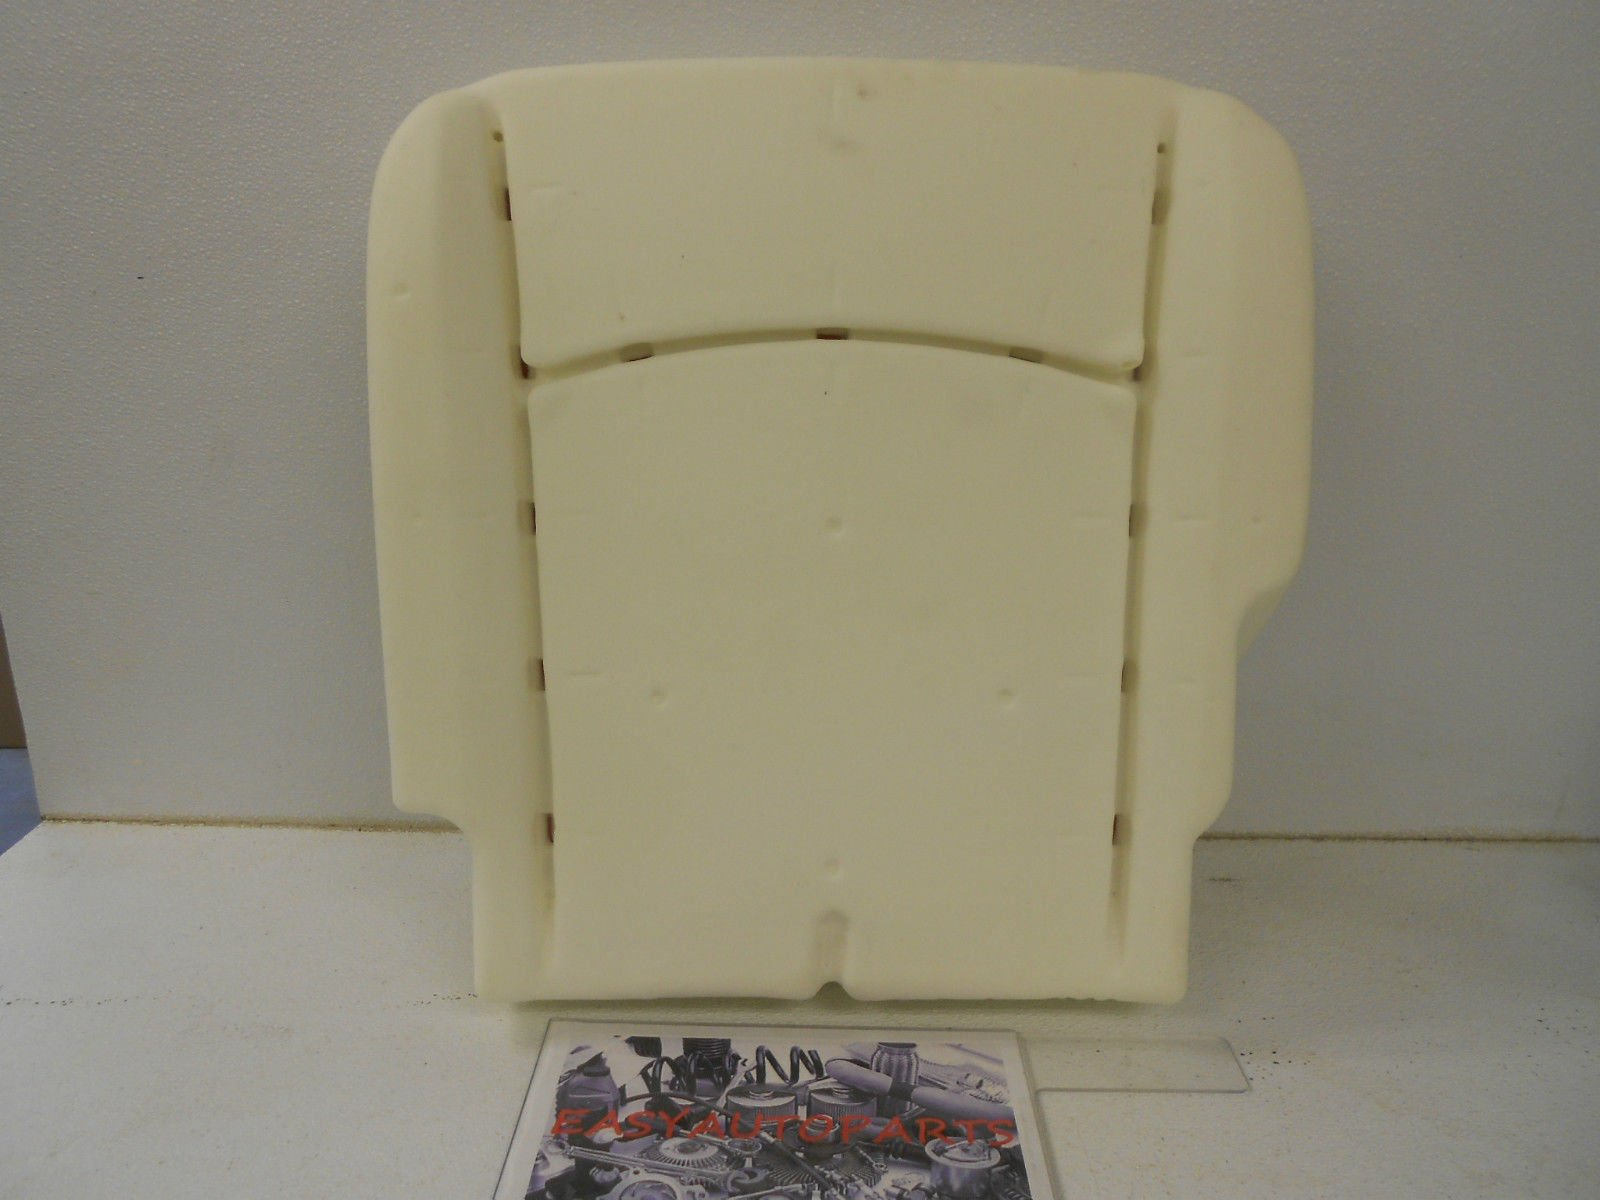 FOAM-SEAT CUSHION